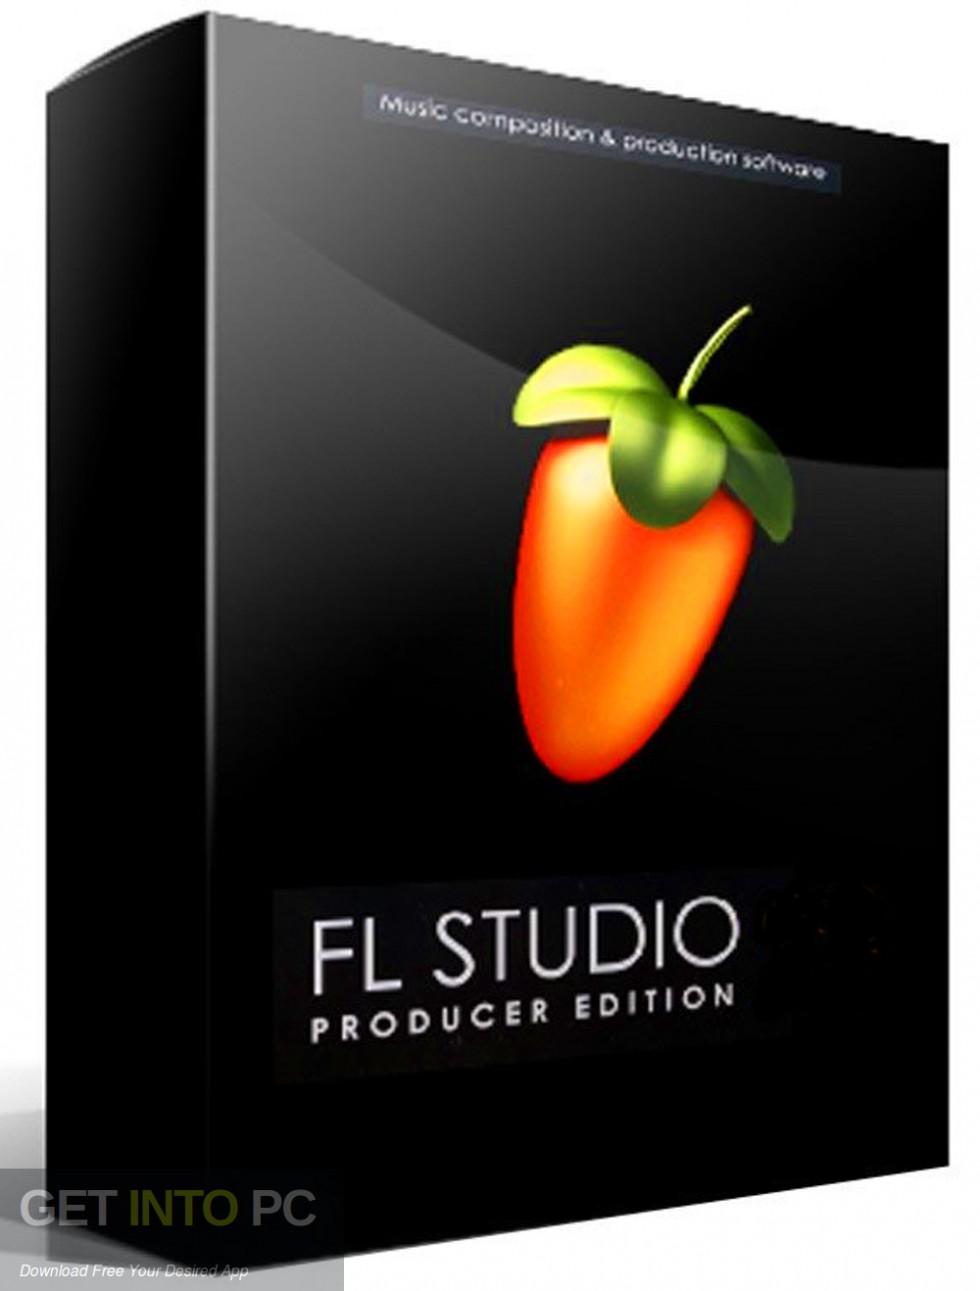 FL Studio Producer Edition + Signature Bundle v20.5 Free Download-GetintoPC.com